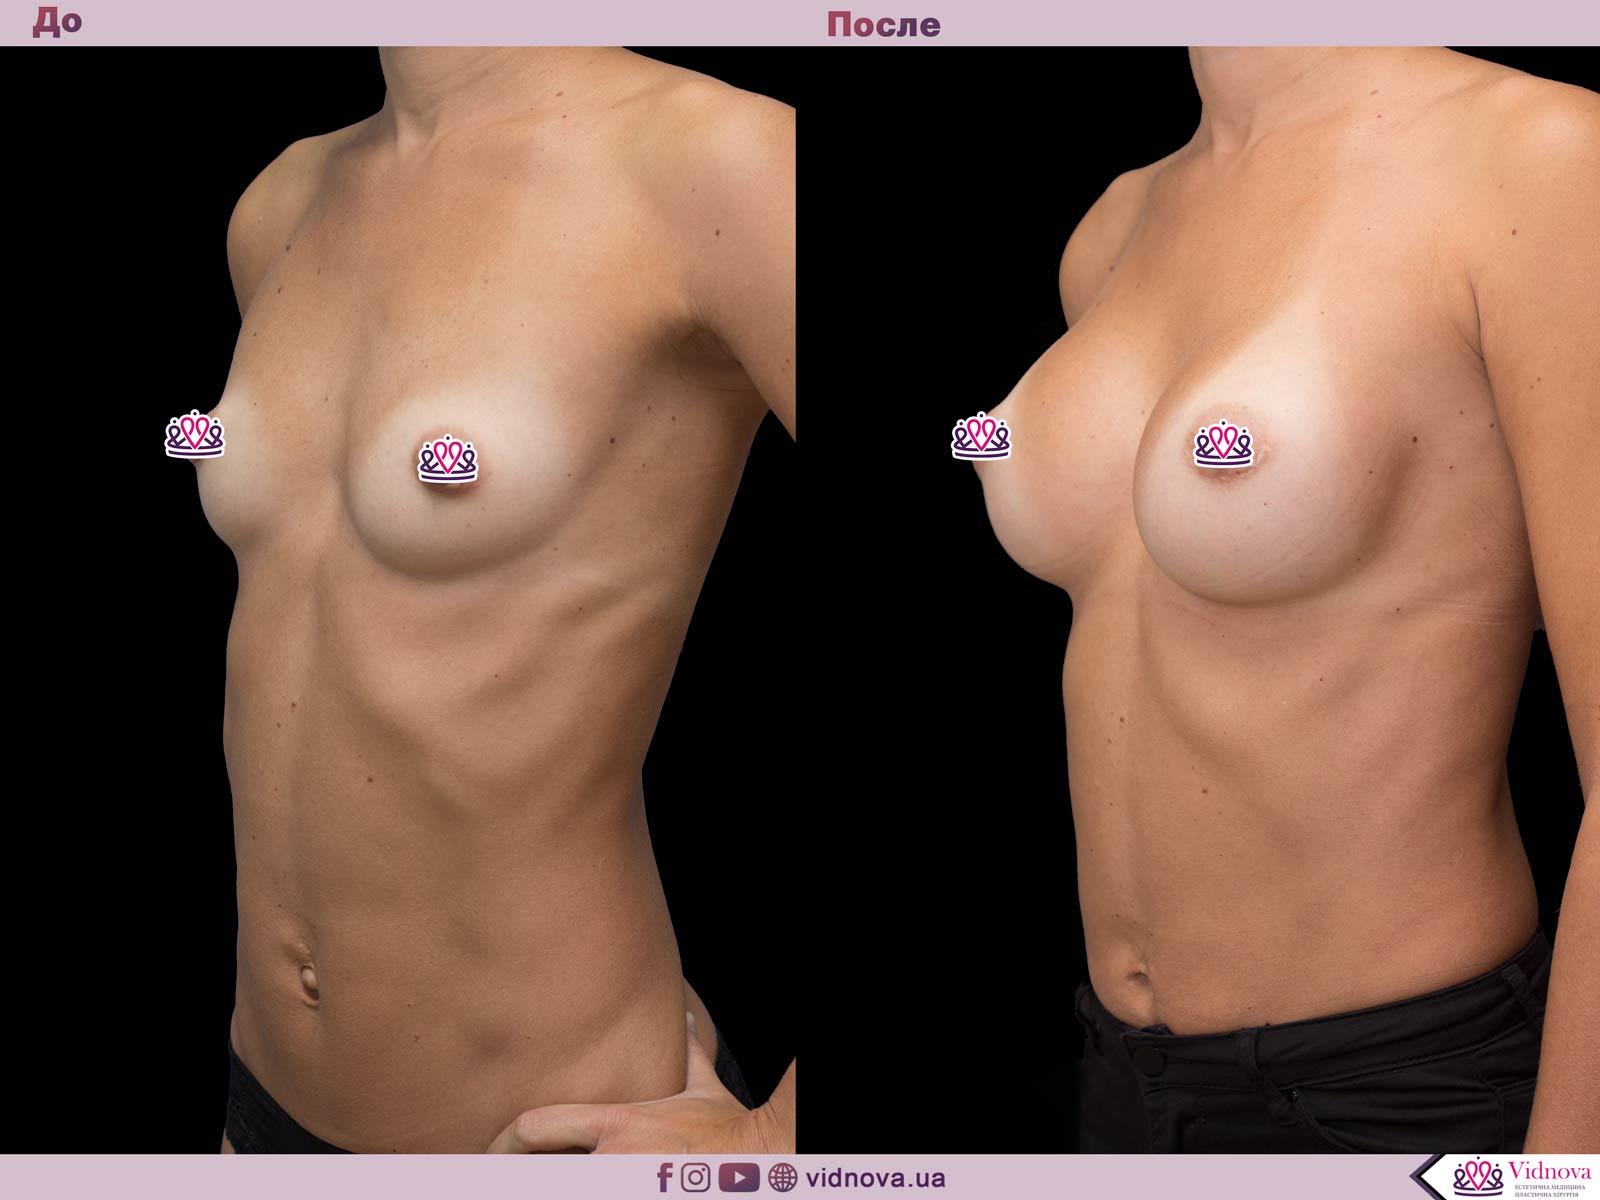 Увеличение груди: Фото ДО и ПОСЛЕ - Пример №45-2 - Клиника Vidnova